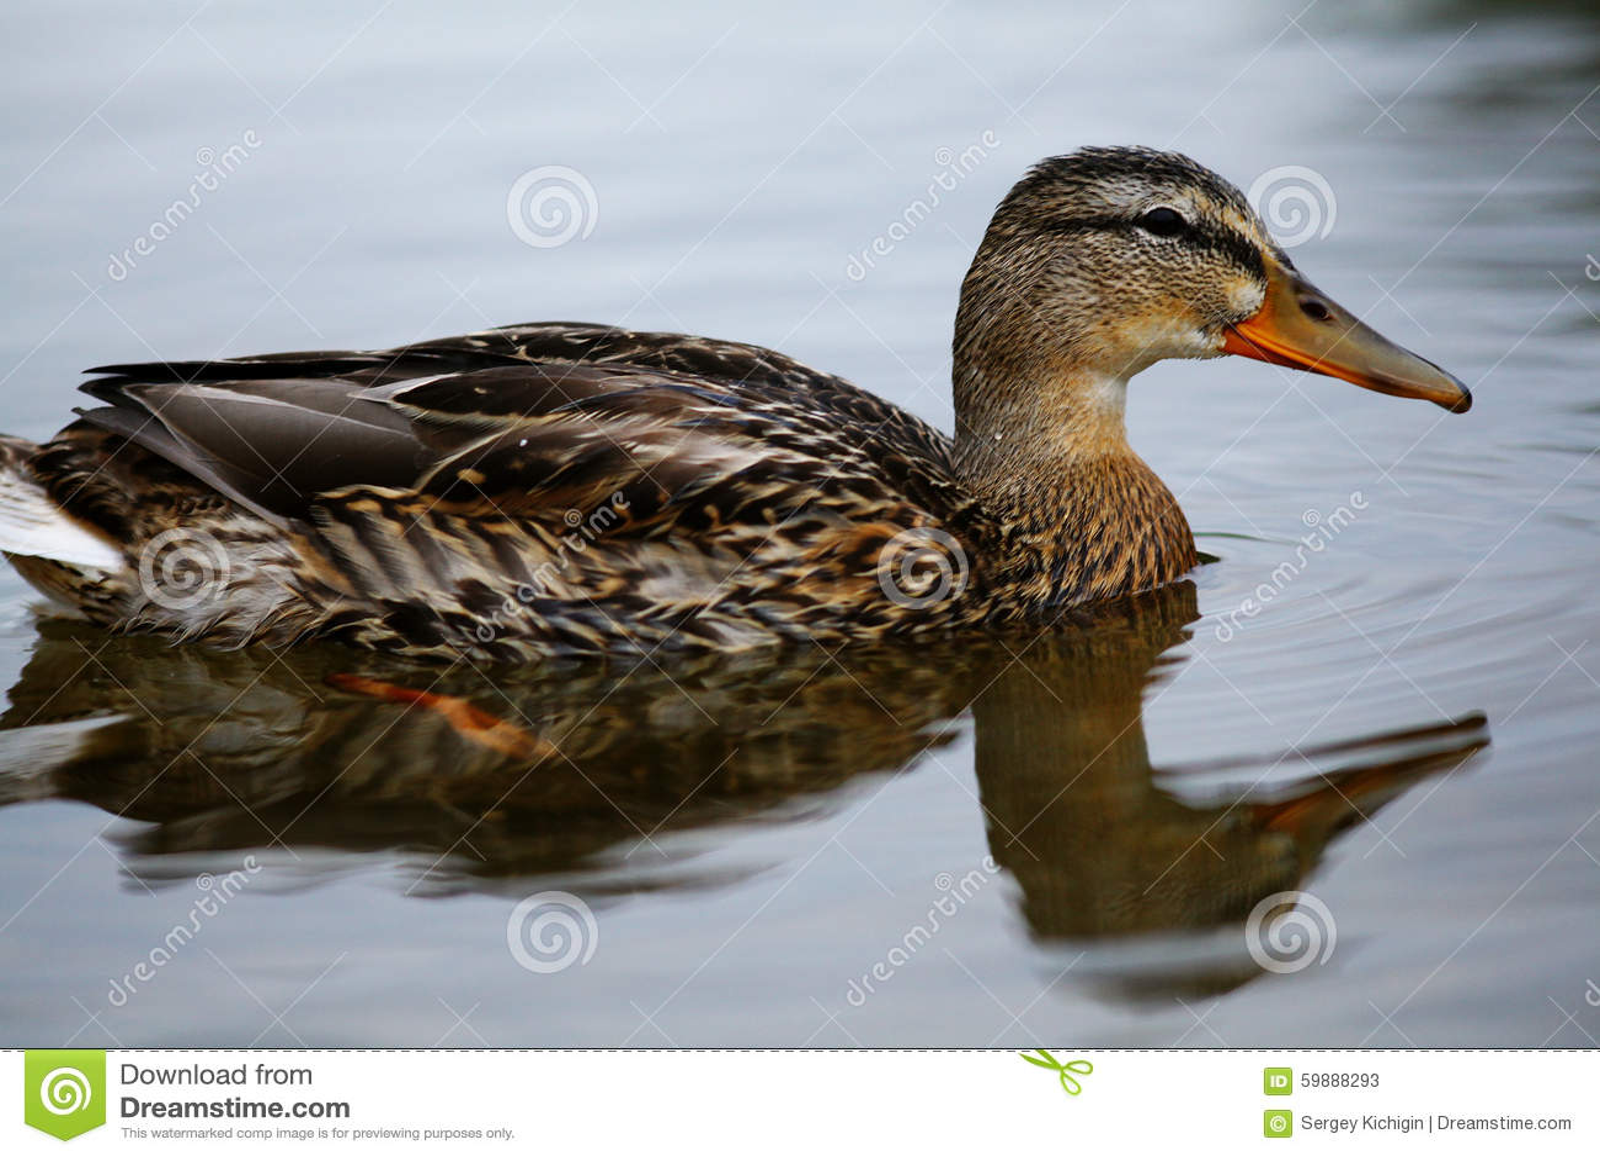 Wild duck swimming in pond